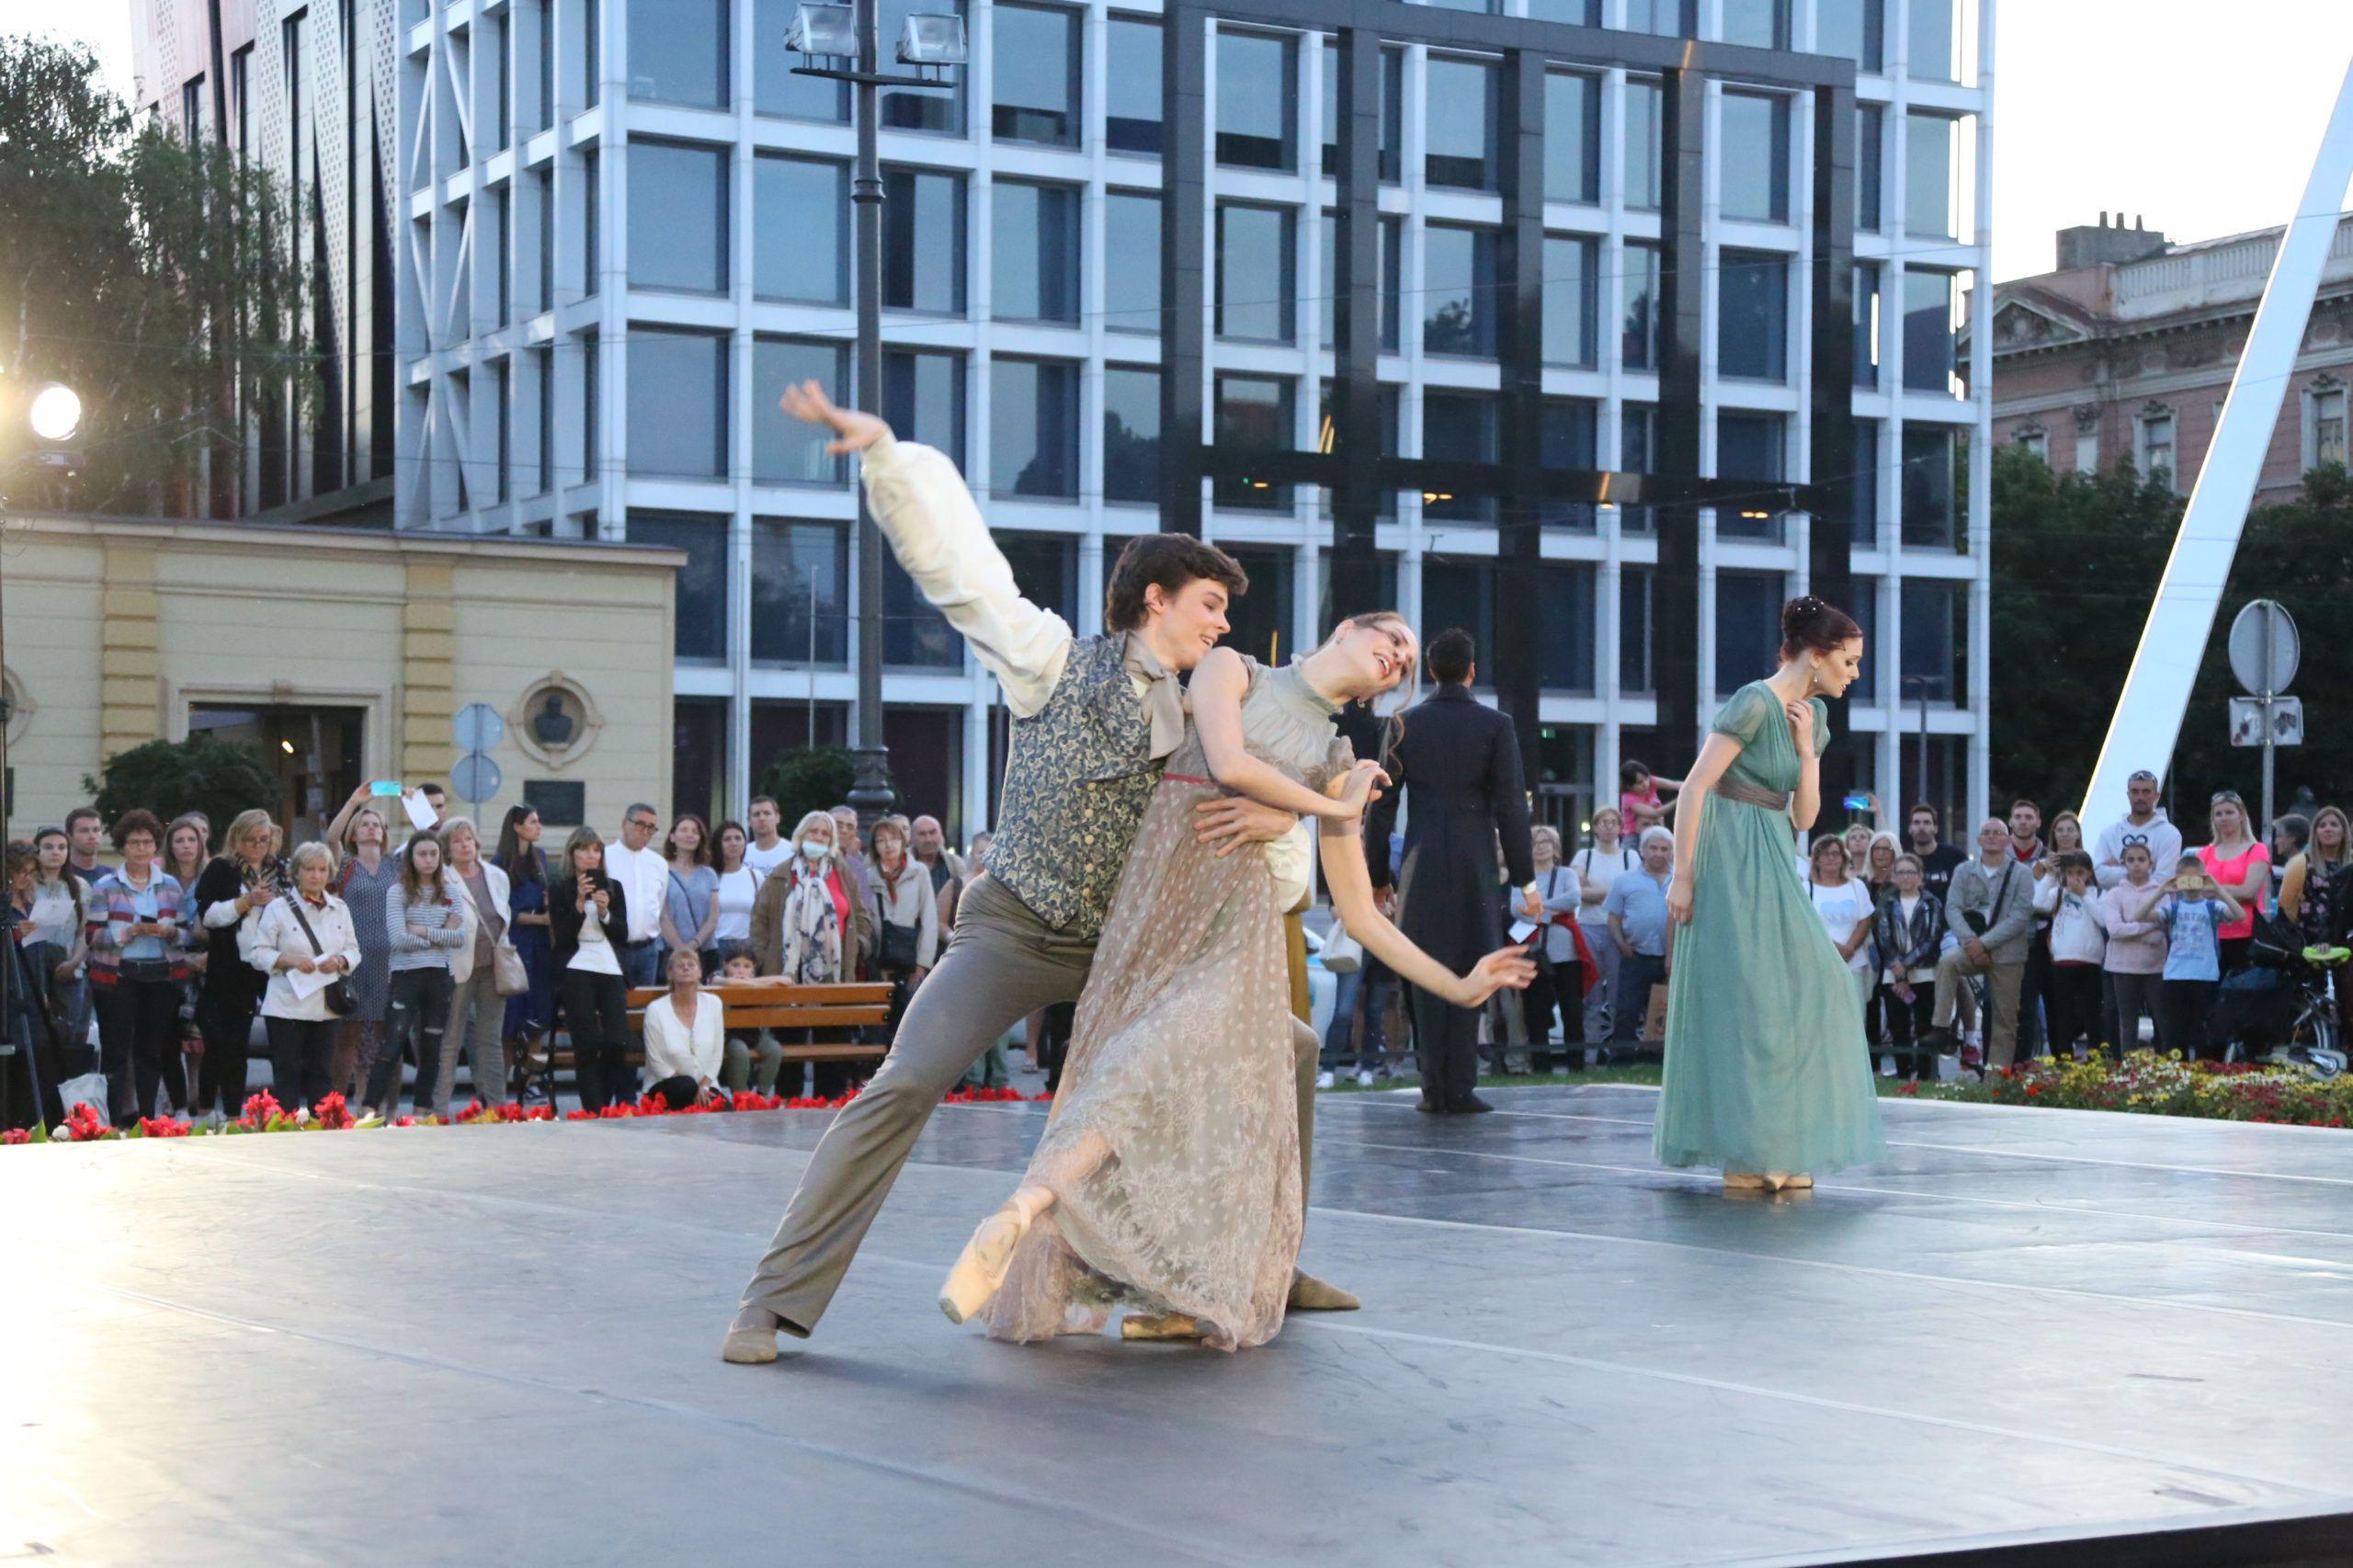 Ljetne večeri HNK u Zagrebu otvorio je scensko glazbeni događaj Lipanjska noć